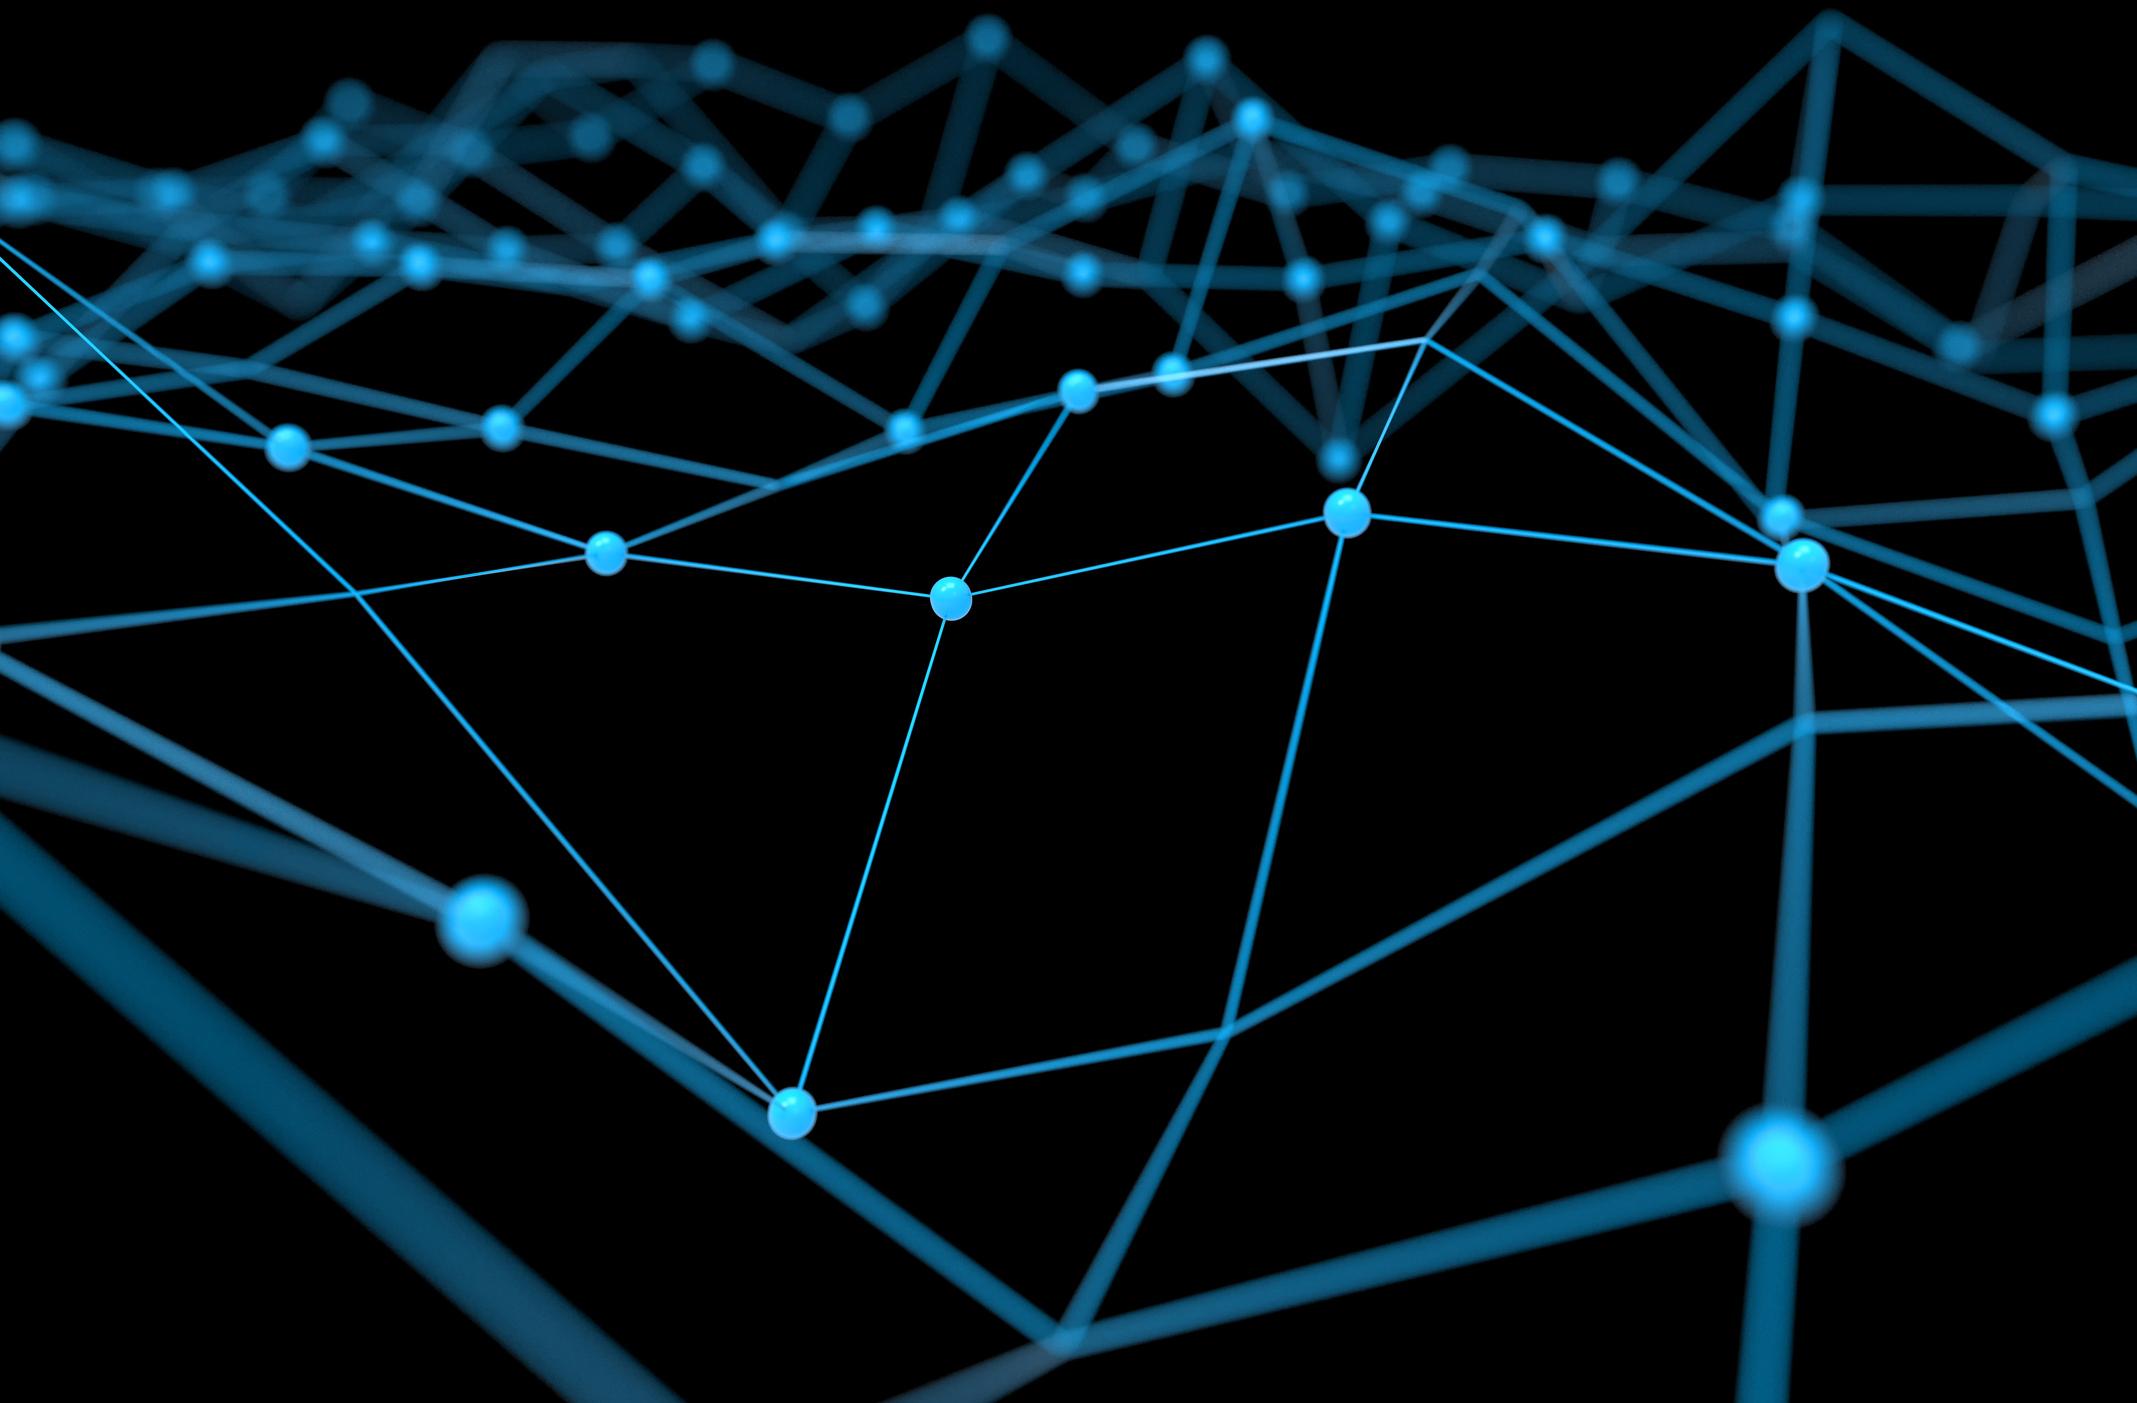 HSBC, Deutsche Bank, And IBM Are Beta Testing Bank Transfers Based On Blockchain